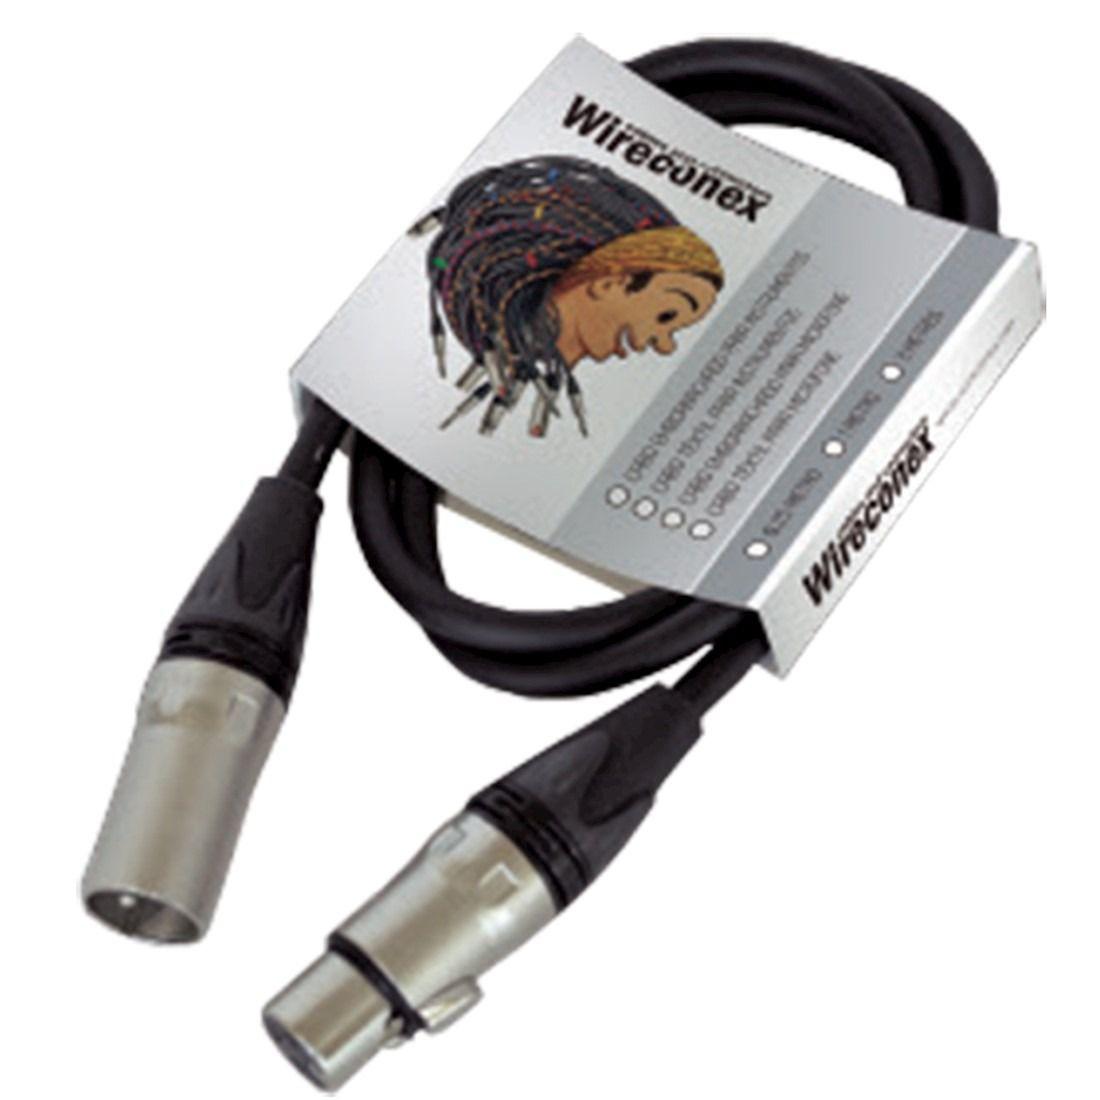 Cabo Wireconex Xlr 10M Mpbe10